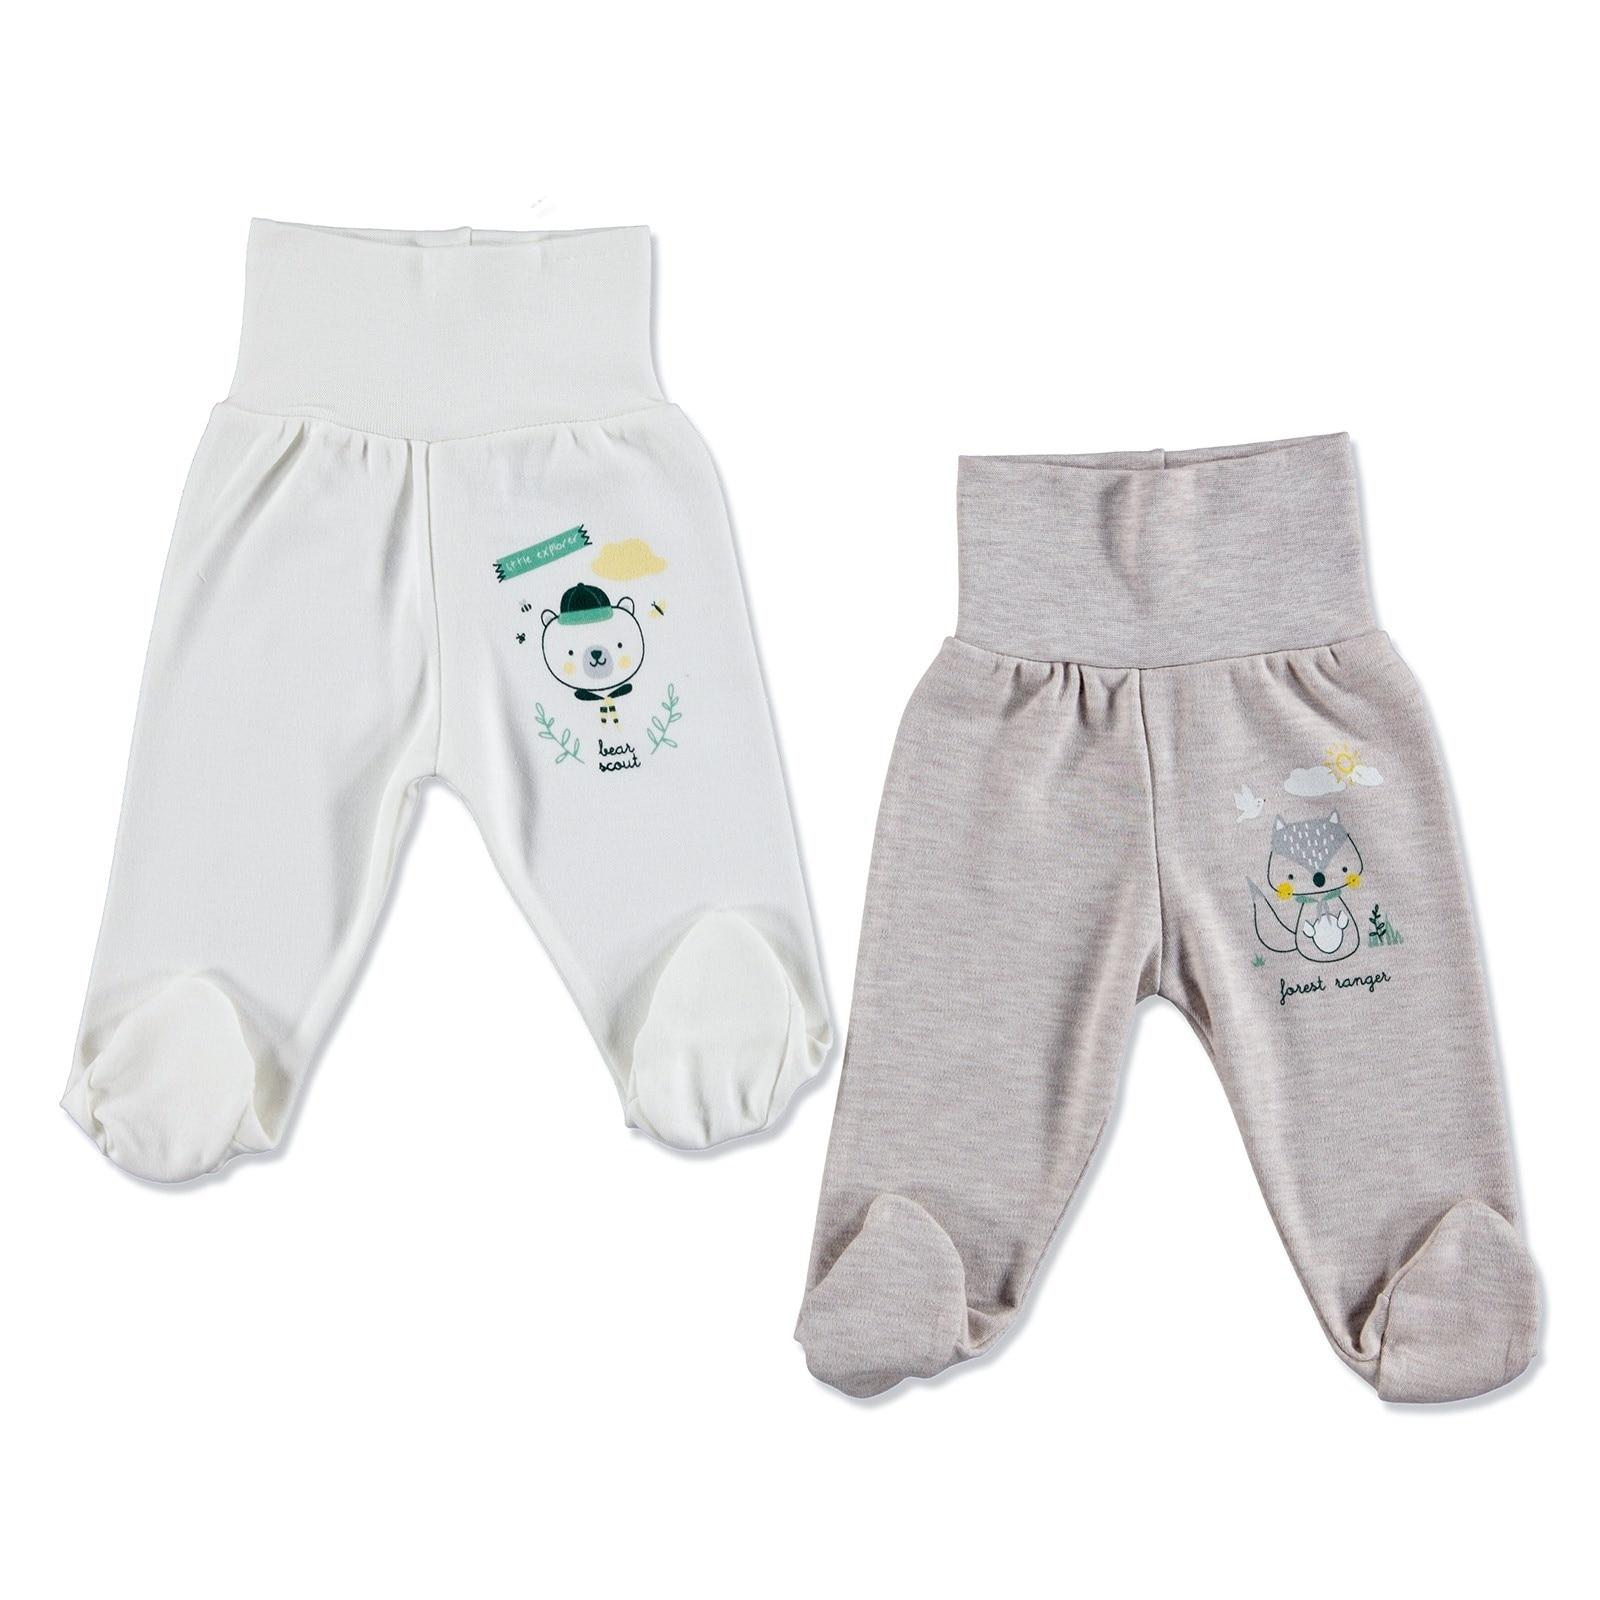 Ebebek HelloBaby Baby Boy Comfort Waist Footed Pant 2 Pcs